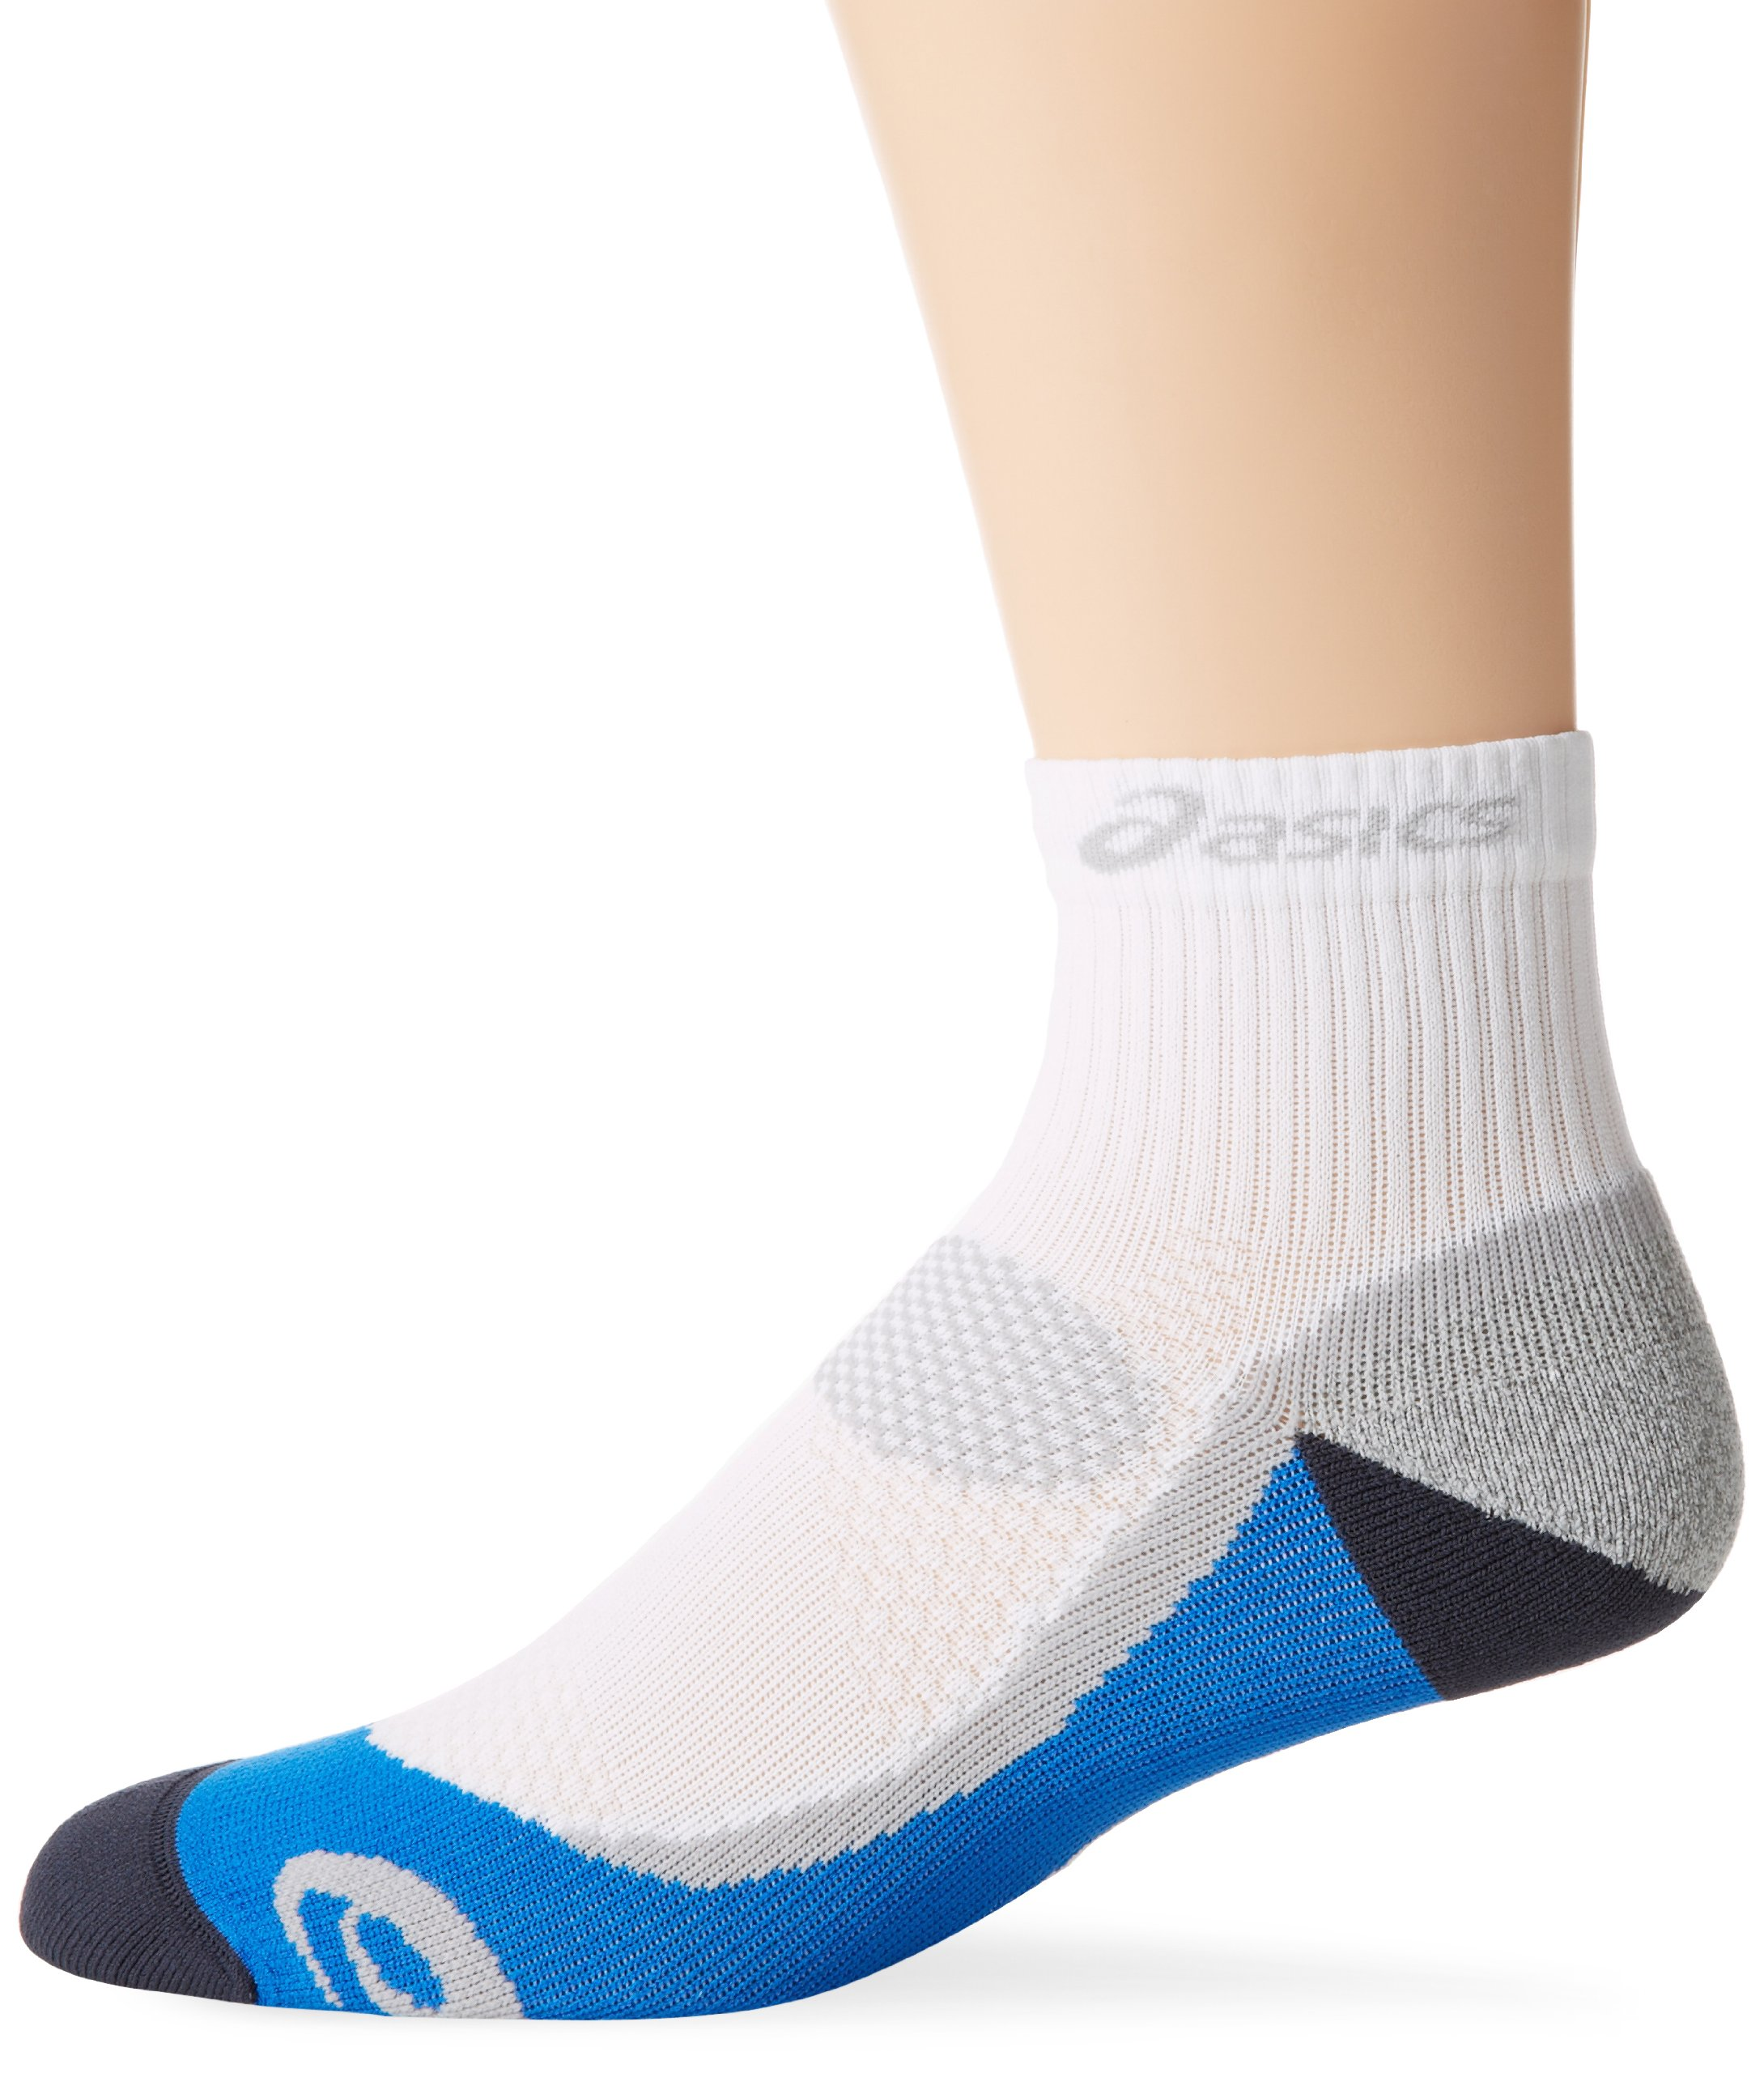 ASICS Kayano Classic Quarter Socks, White/Iron/Fresh Blue/Frost, 1-Pair, X-Small